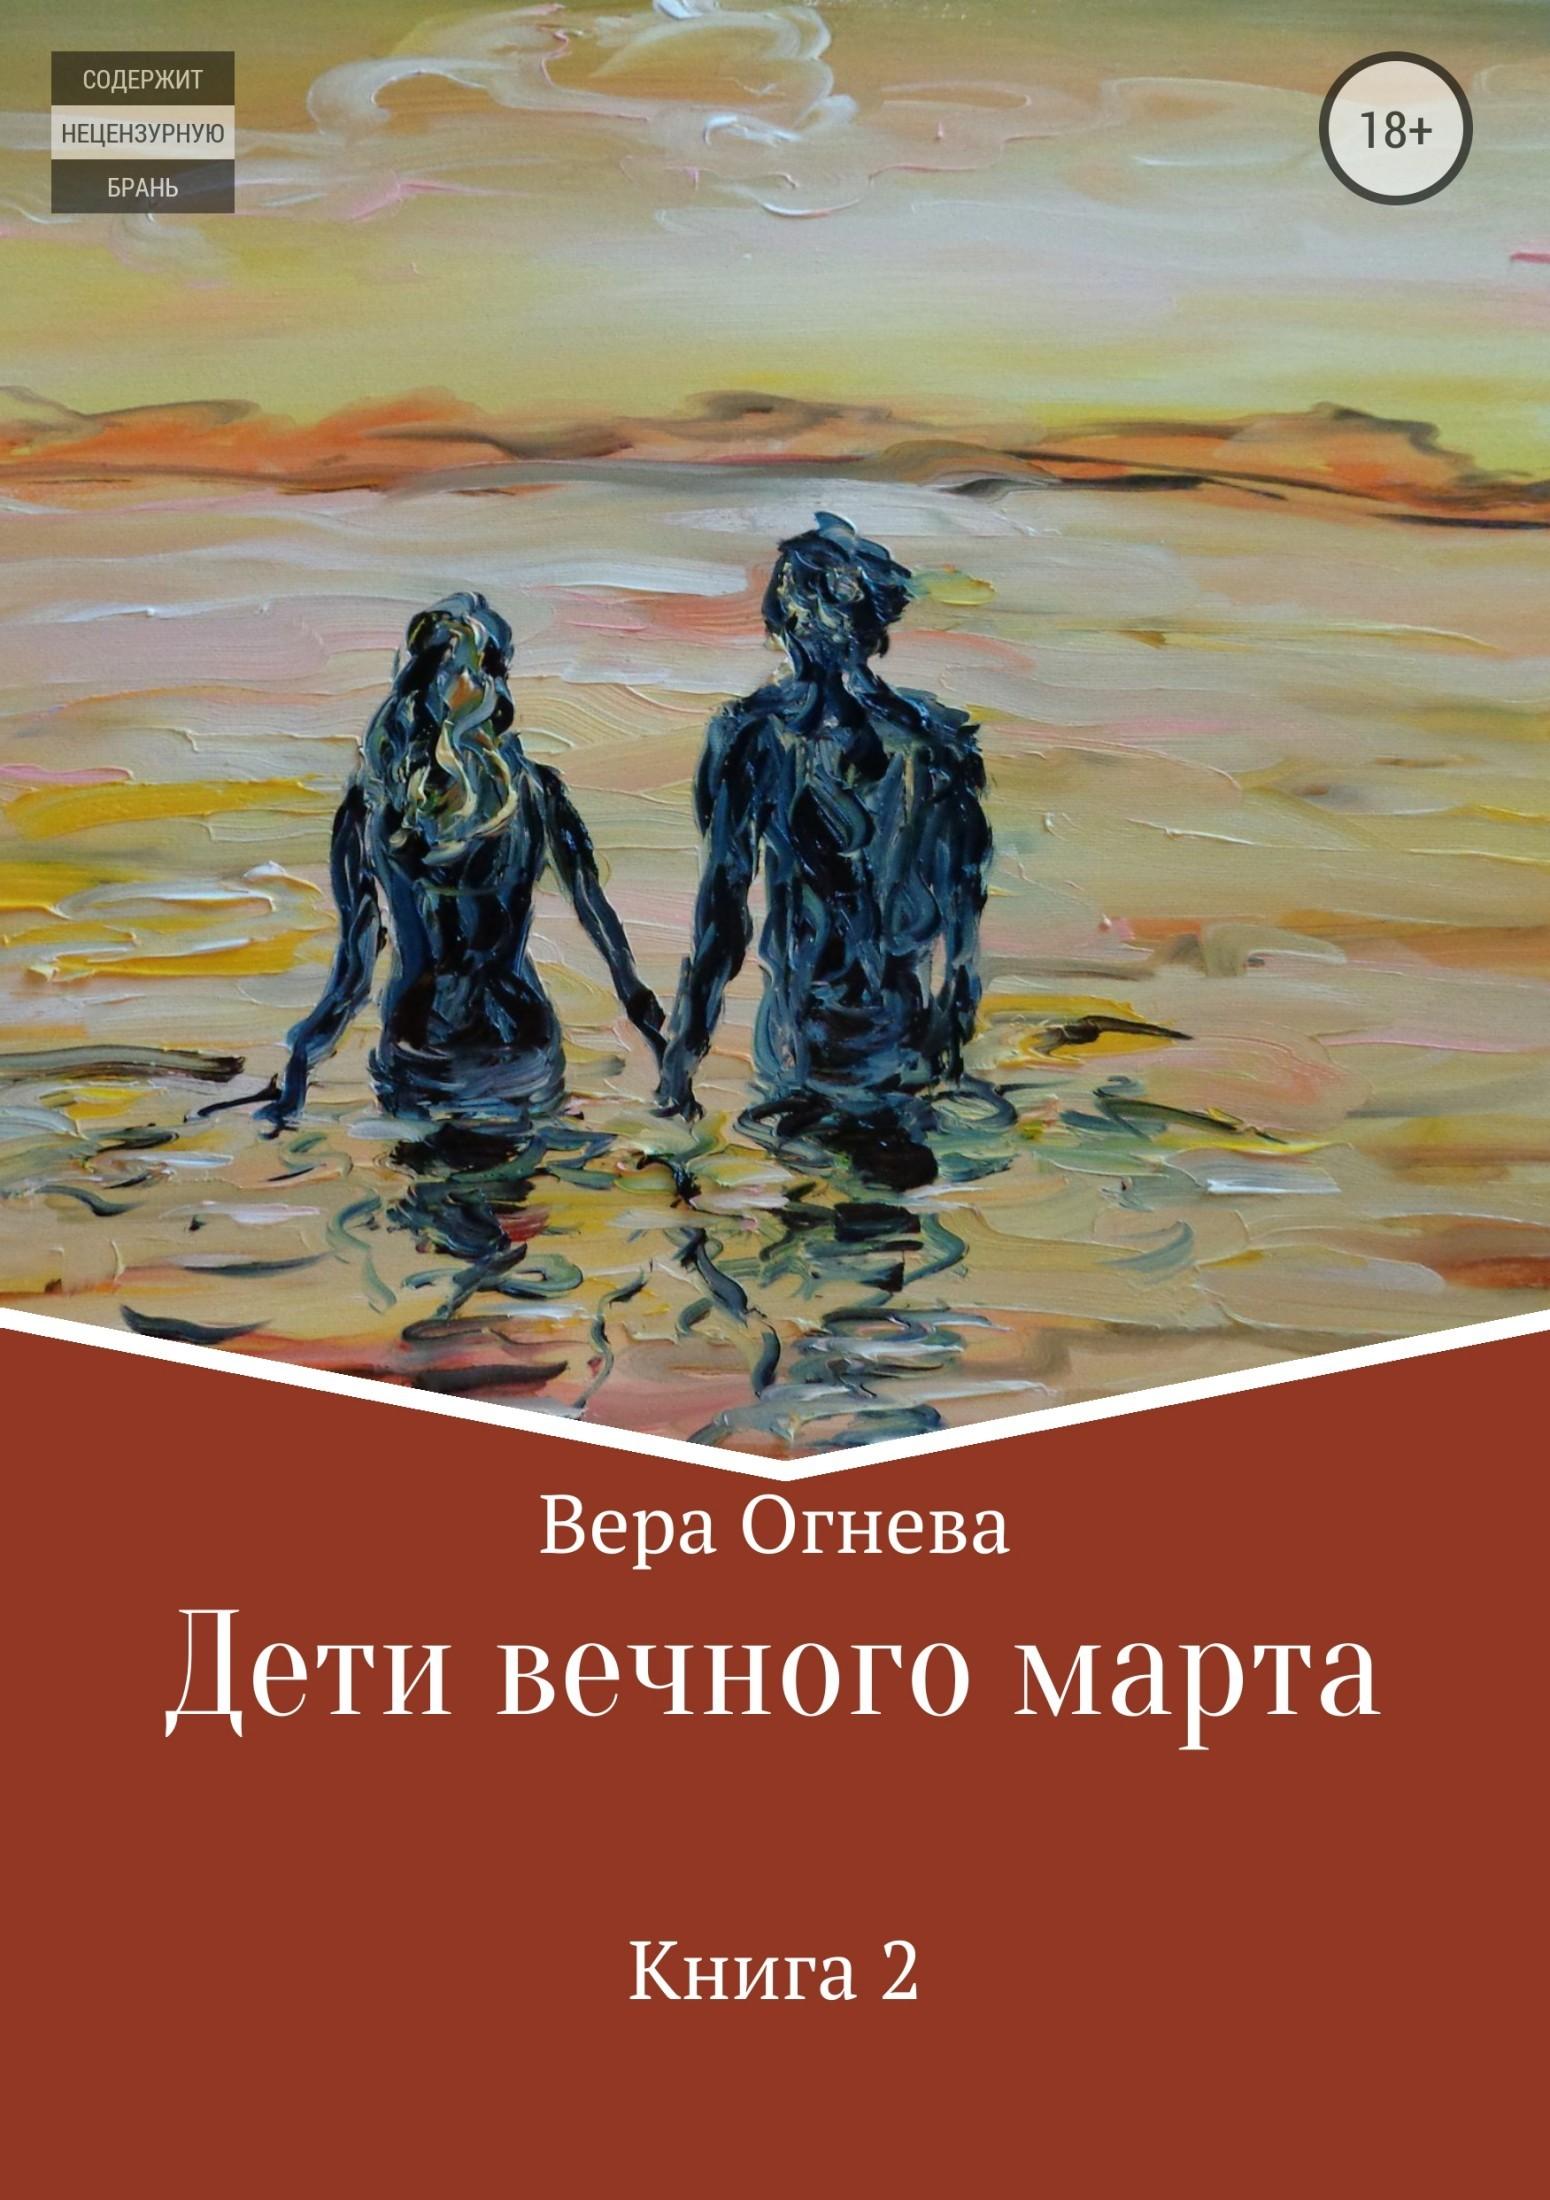 Вера Евгеньевна Огнева Дети вечного марта. Книга 2